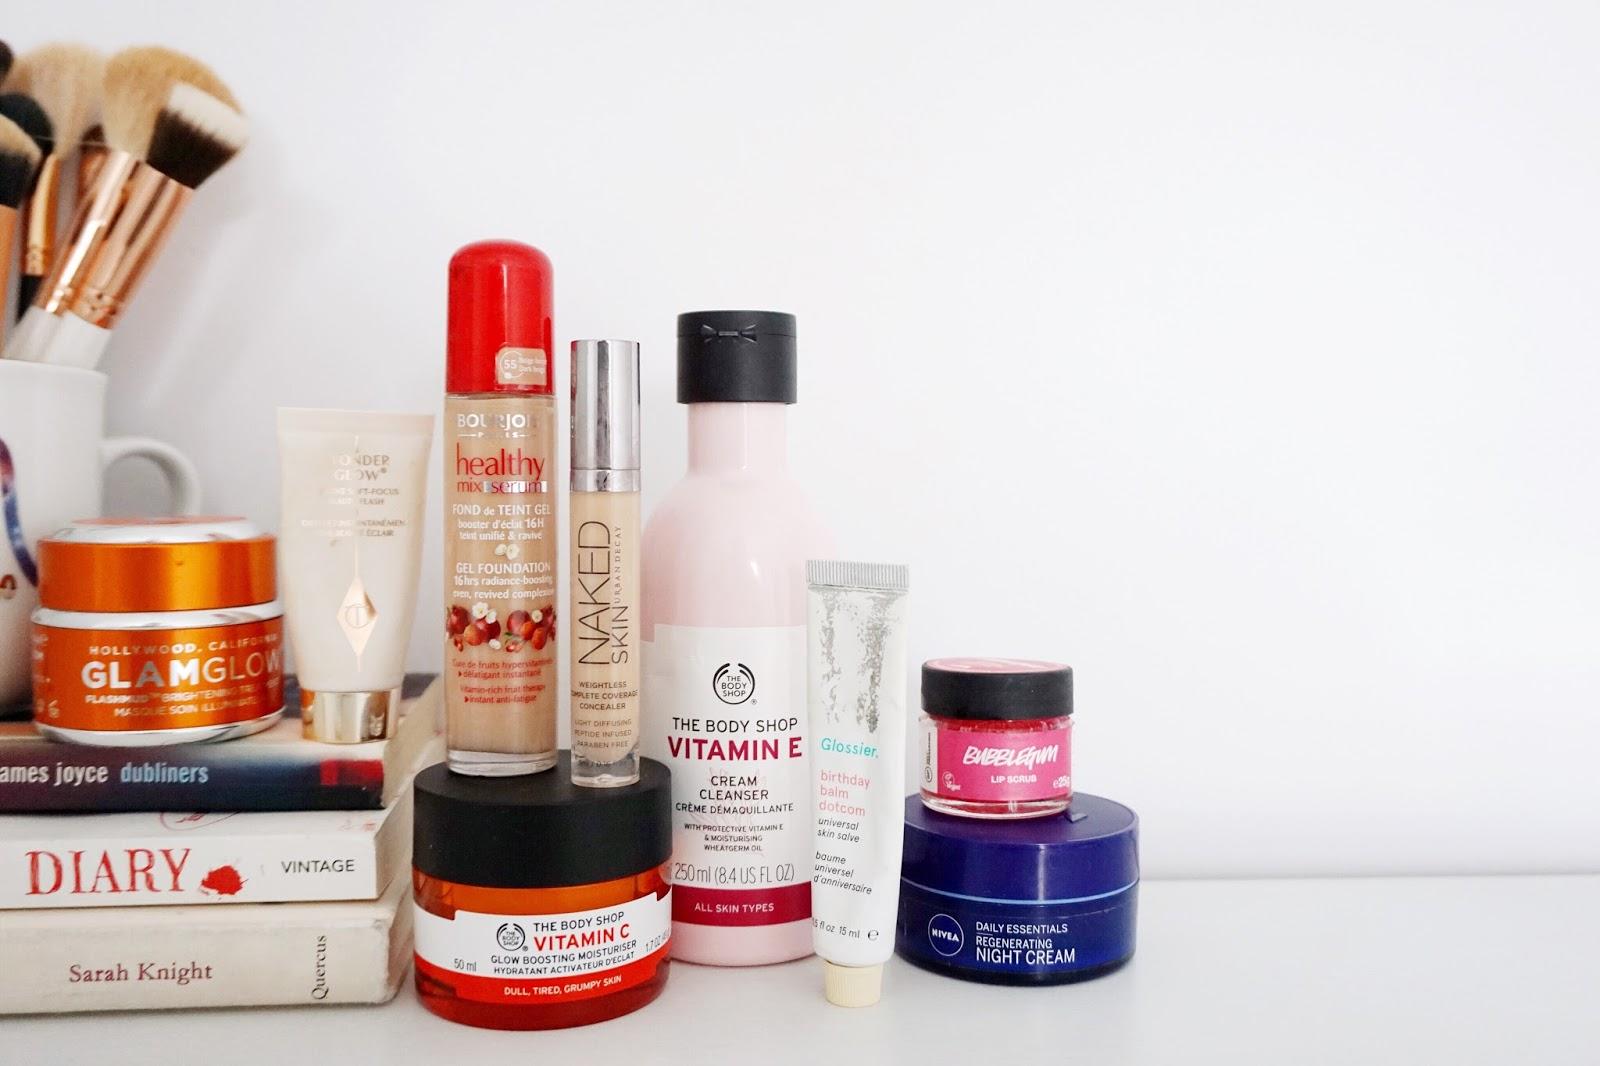 Glamglow, Lush, Glossier, The Body Shop, Charlotte Tilbury, Bourjois, Urban Decay, Nivea